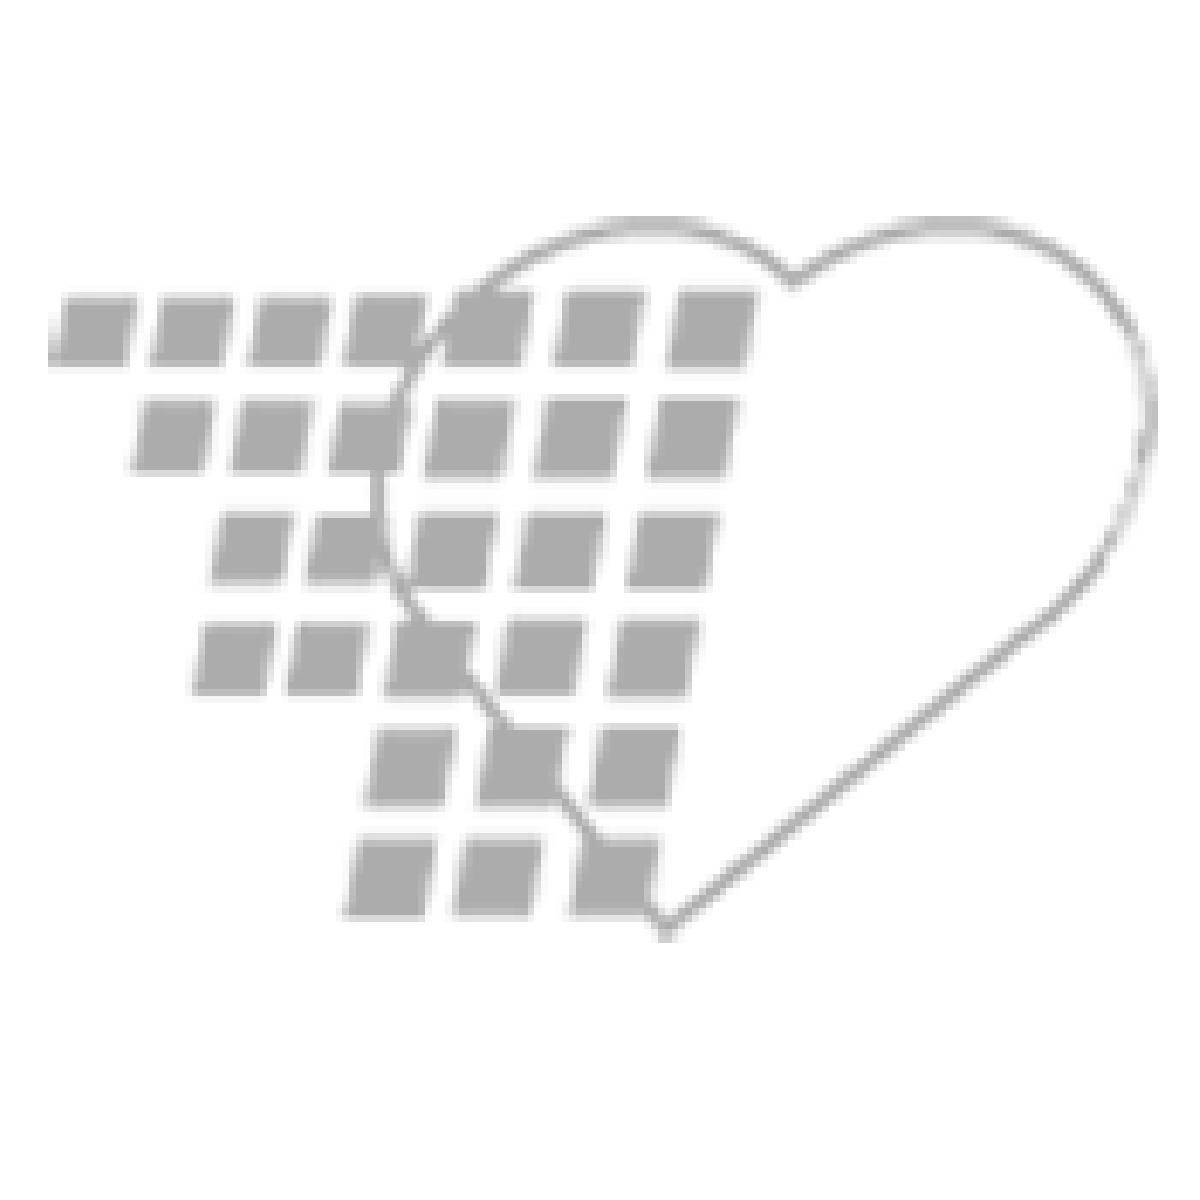 06-93-6945 Demo Dose® SURVANT® Intratracheal Suspensin (beractant) 4 mL 25 mg/mL